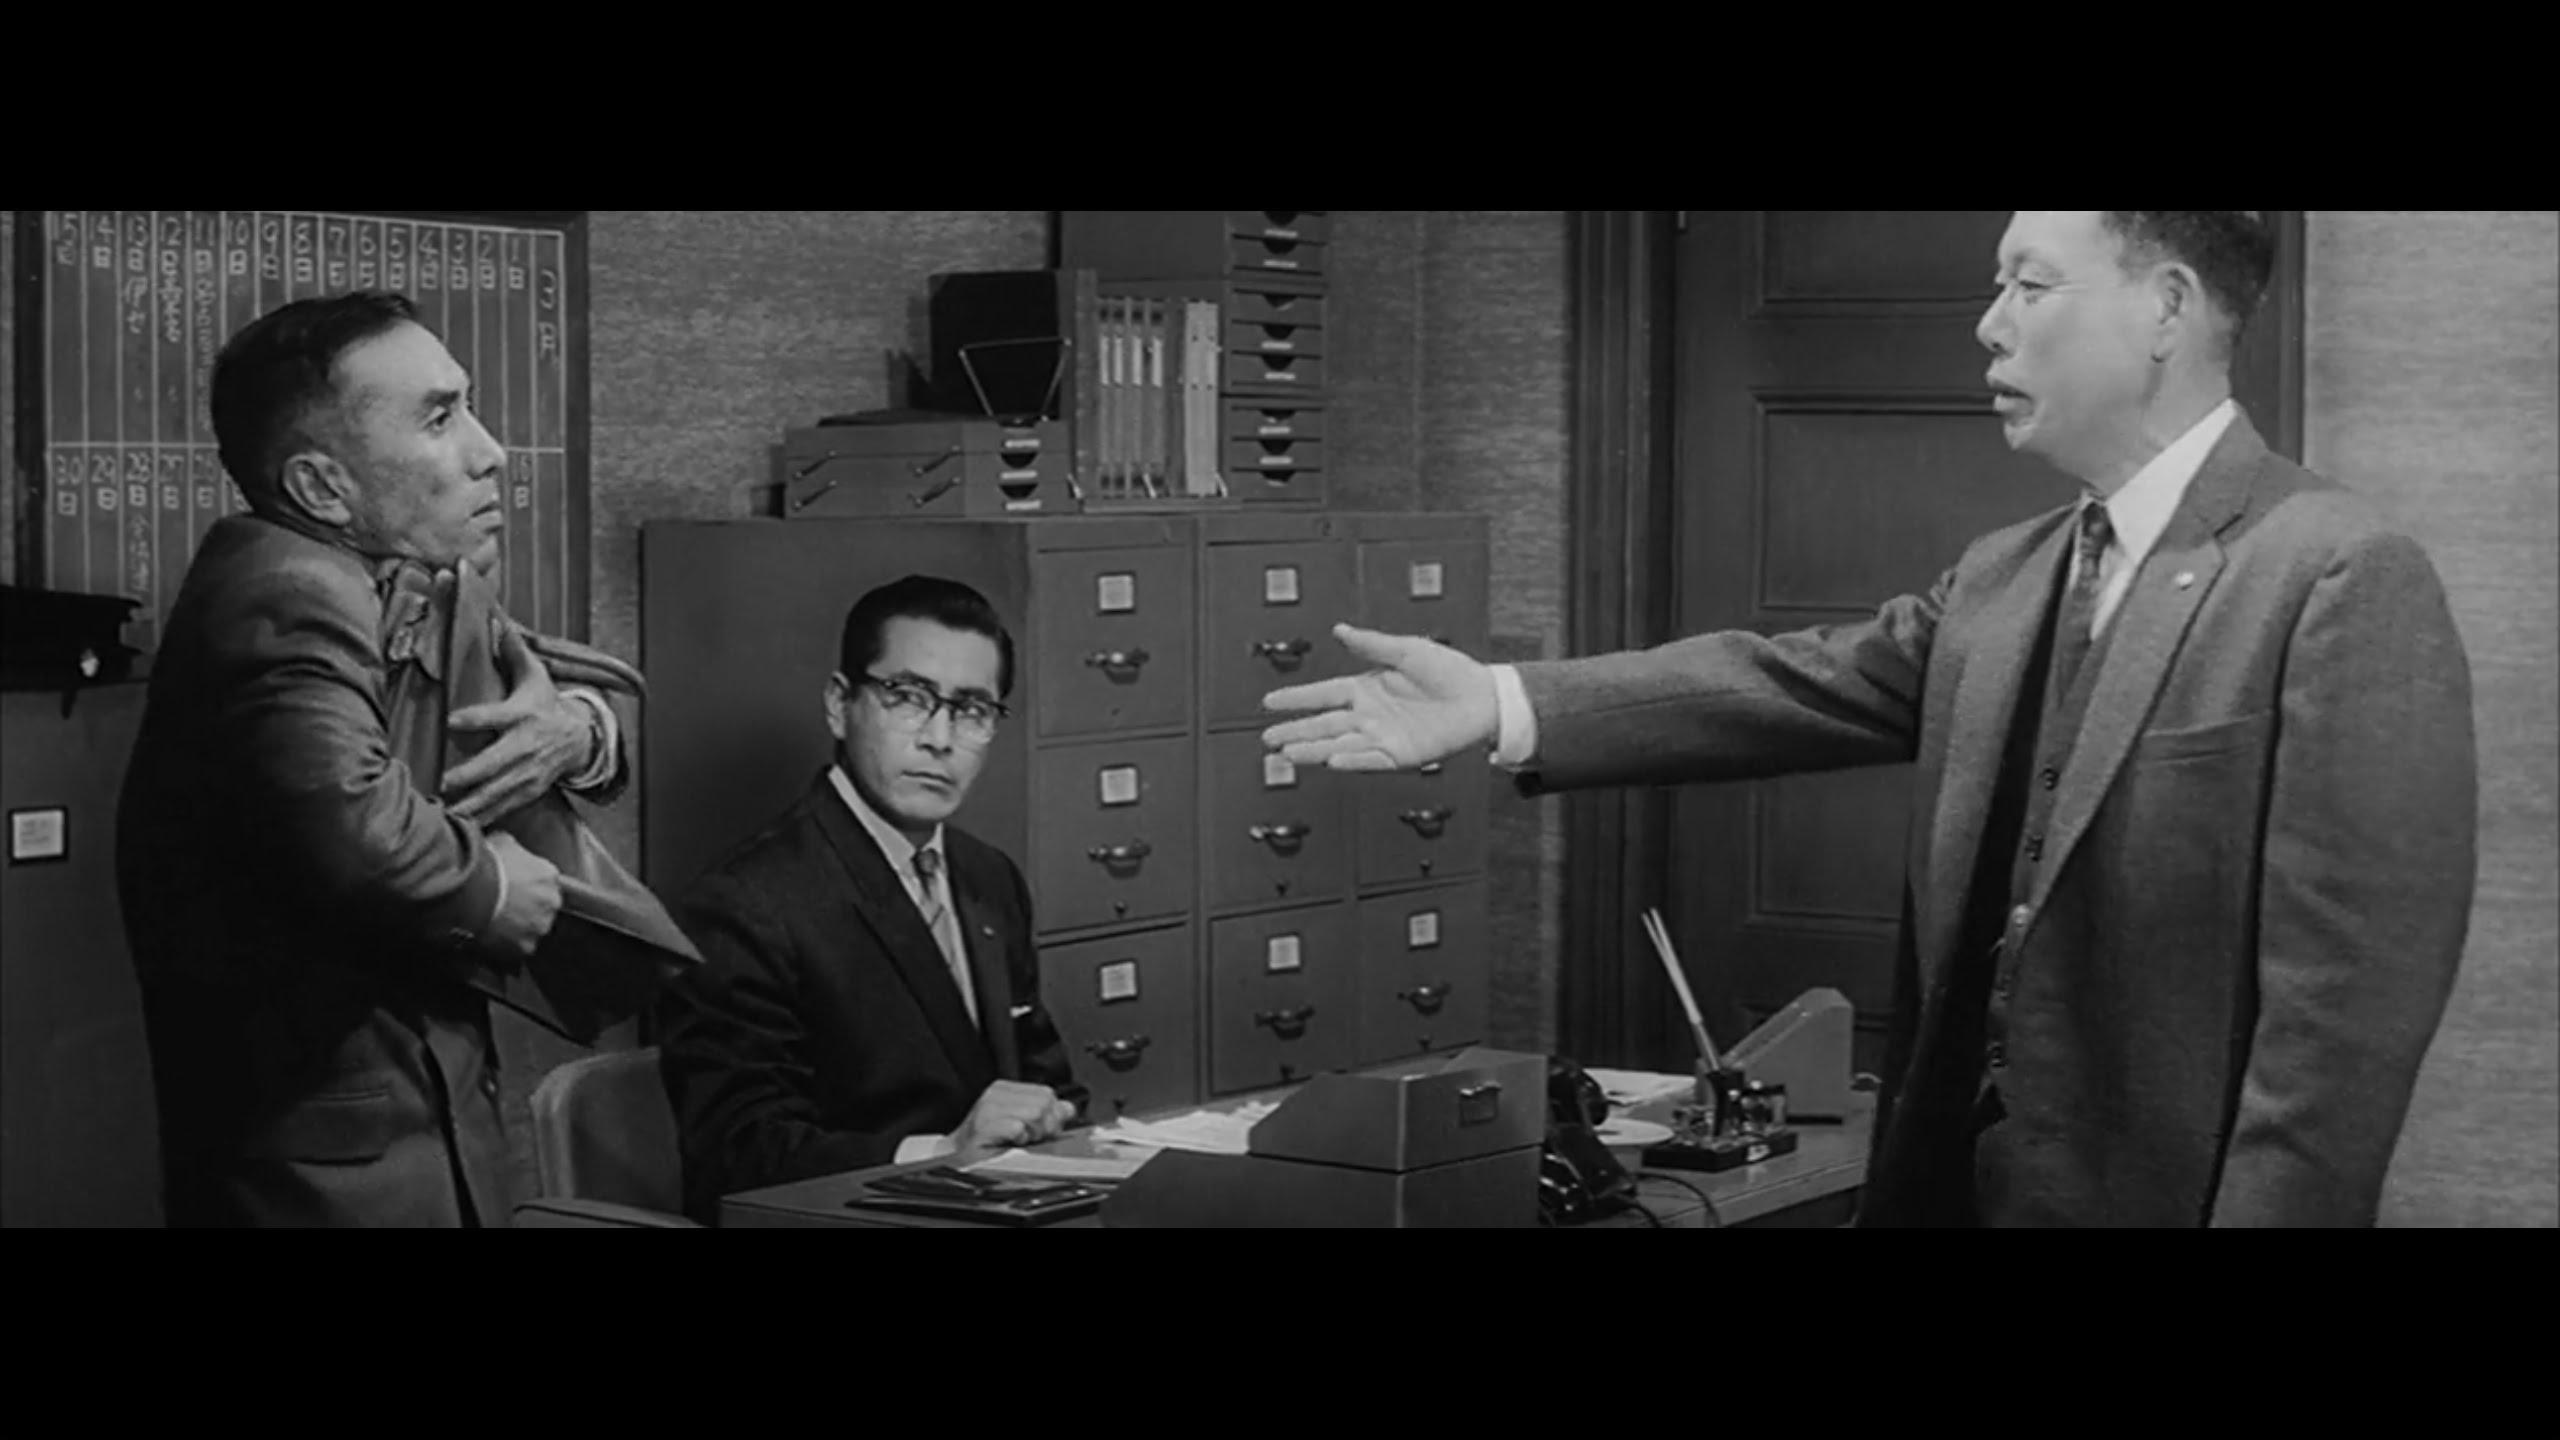 Daylightpeople.com The Bad Sleep Well (1960) - The Geometry of a Scene